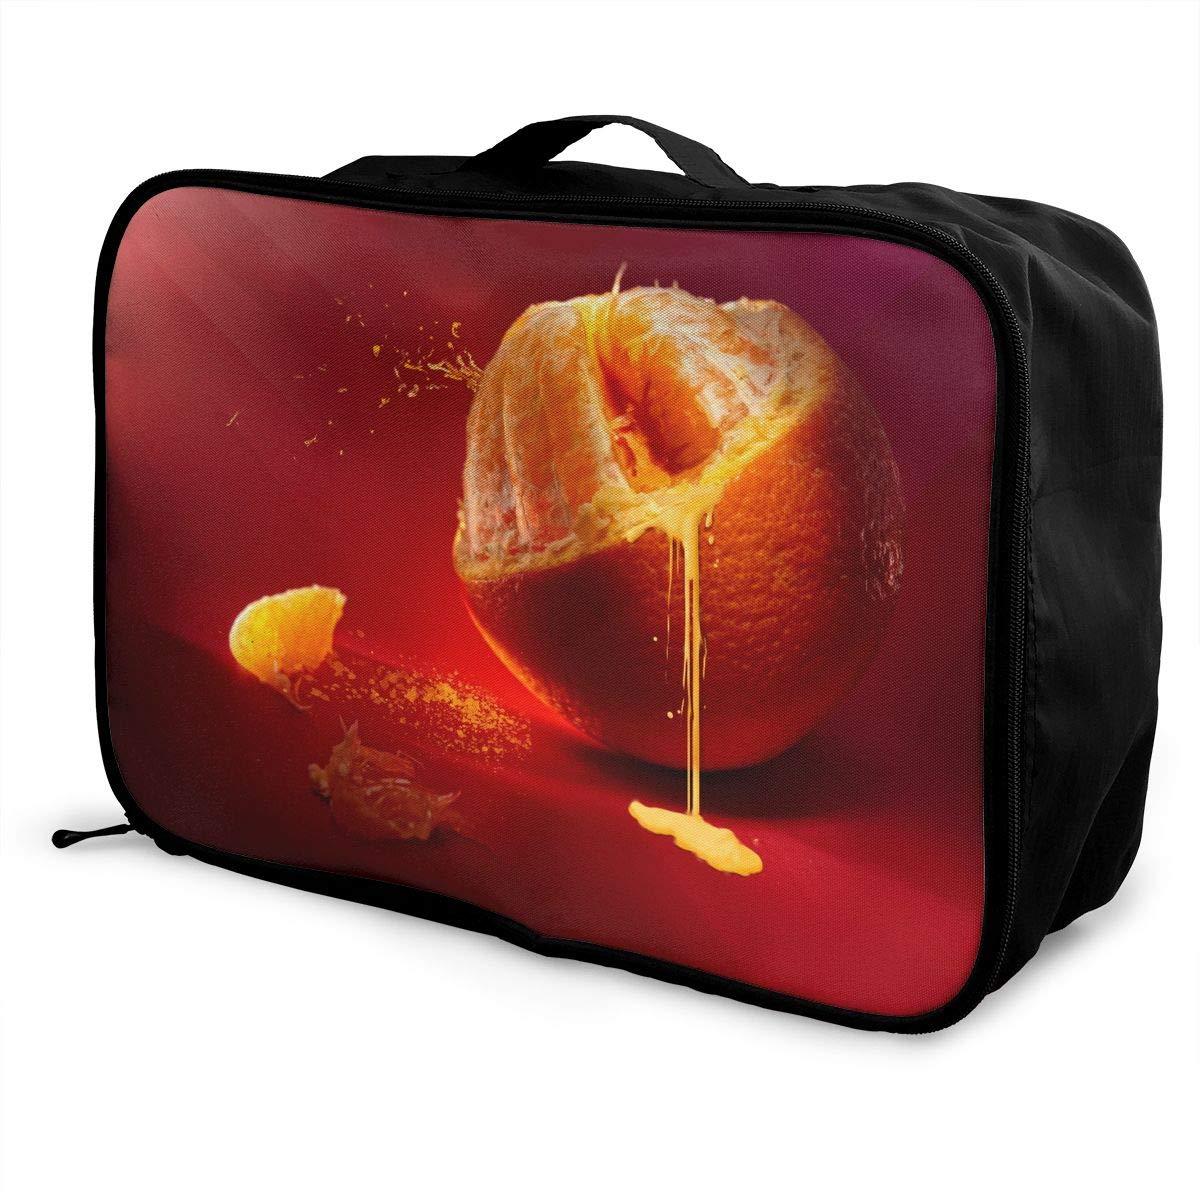 Travel Luggage Duffle Bag Lightweight Portable Handbag Fruit Juice Large Capacity Waterproof Foldable Storage Tote